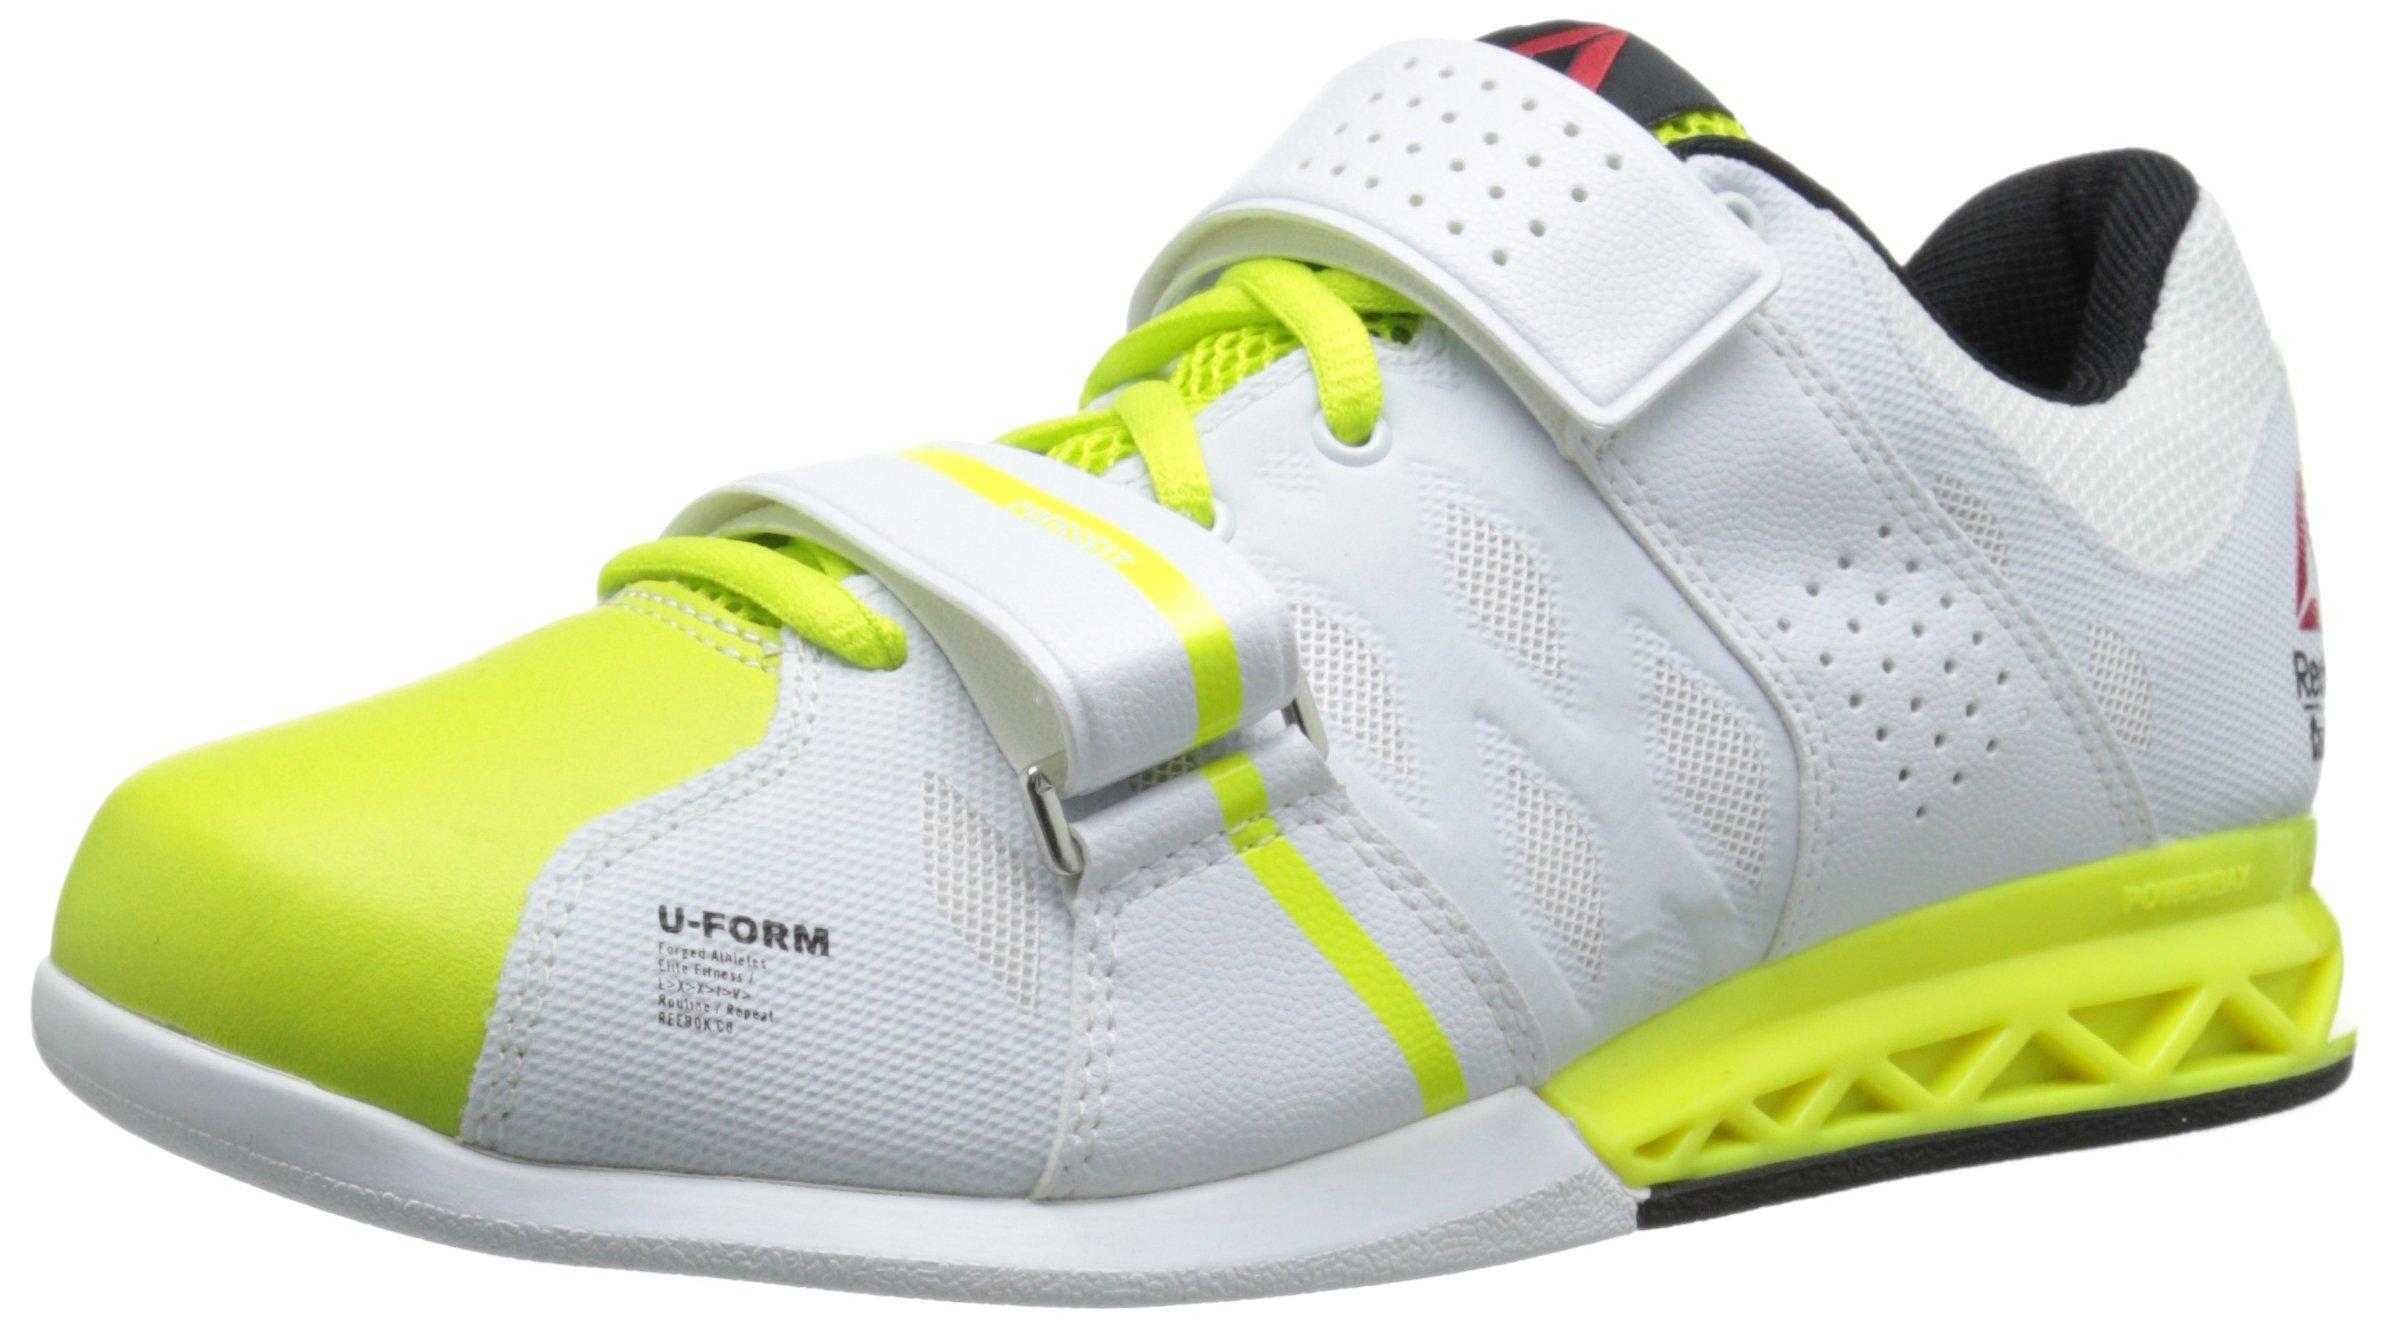 Reebok Women's R Crossfit Lifter Plus 2.0 Training Shoe, Semi Solar Yellow/White/Black, 8.5 M US